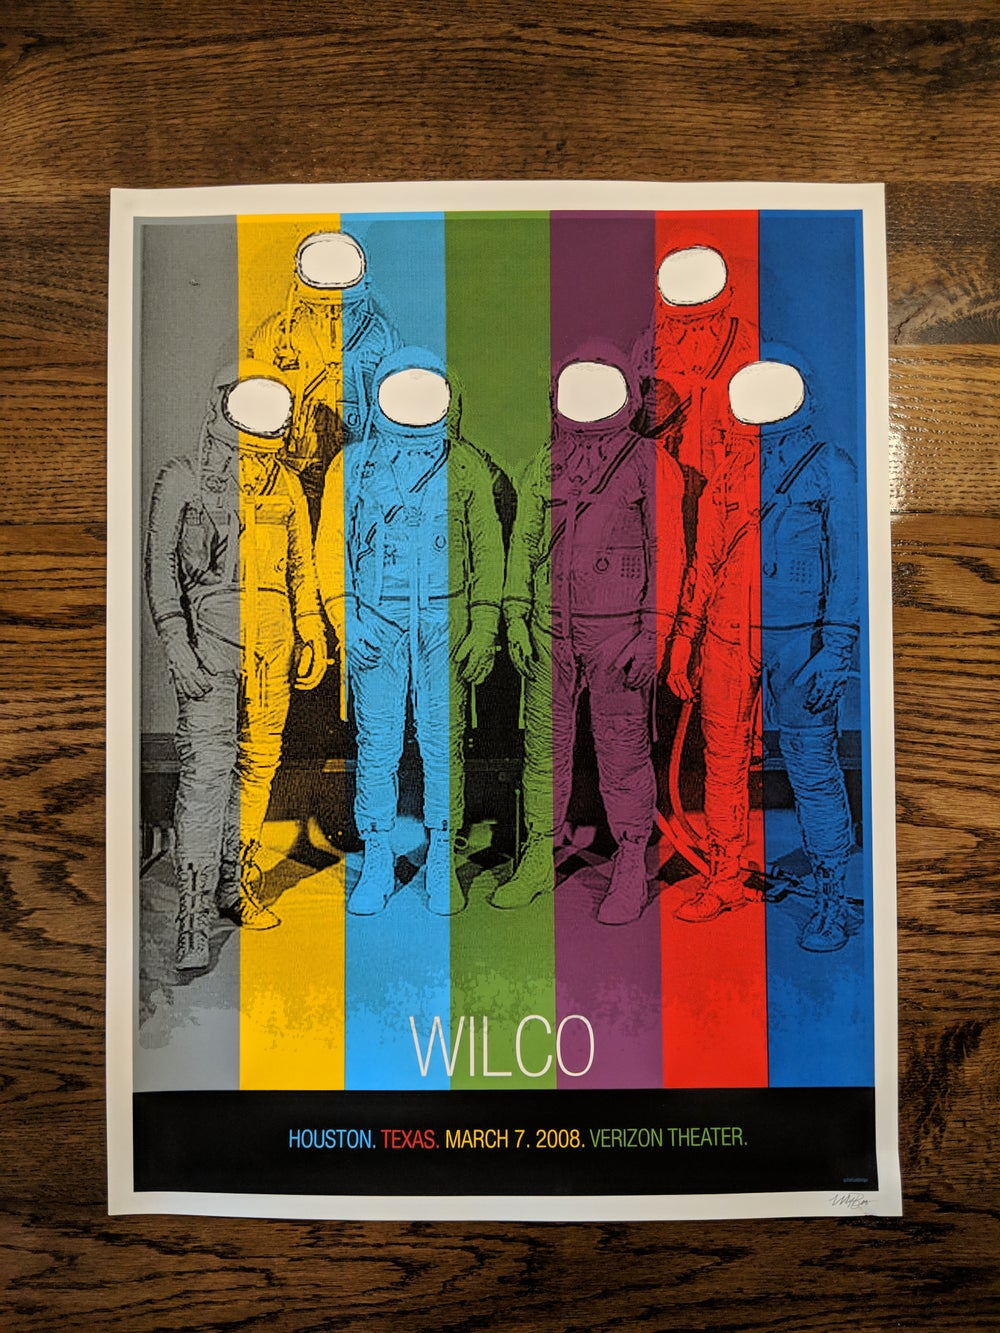 Wilco (Astronauts), Houston, Texas